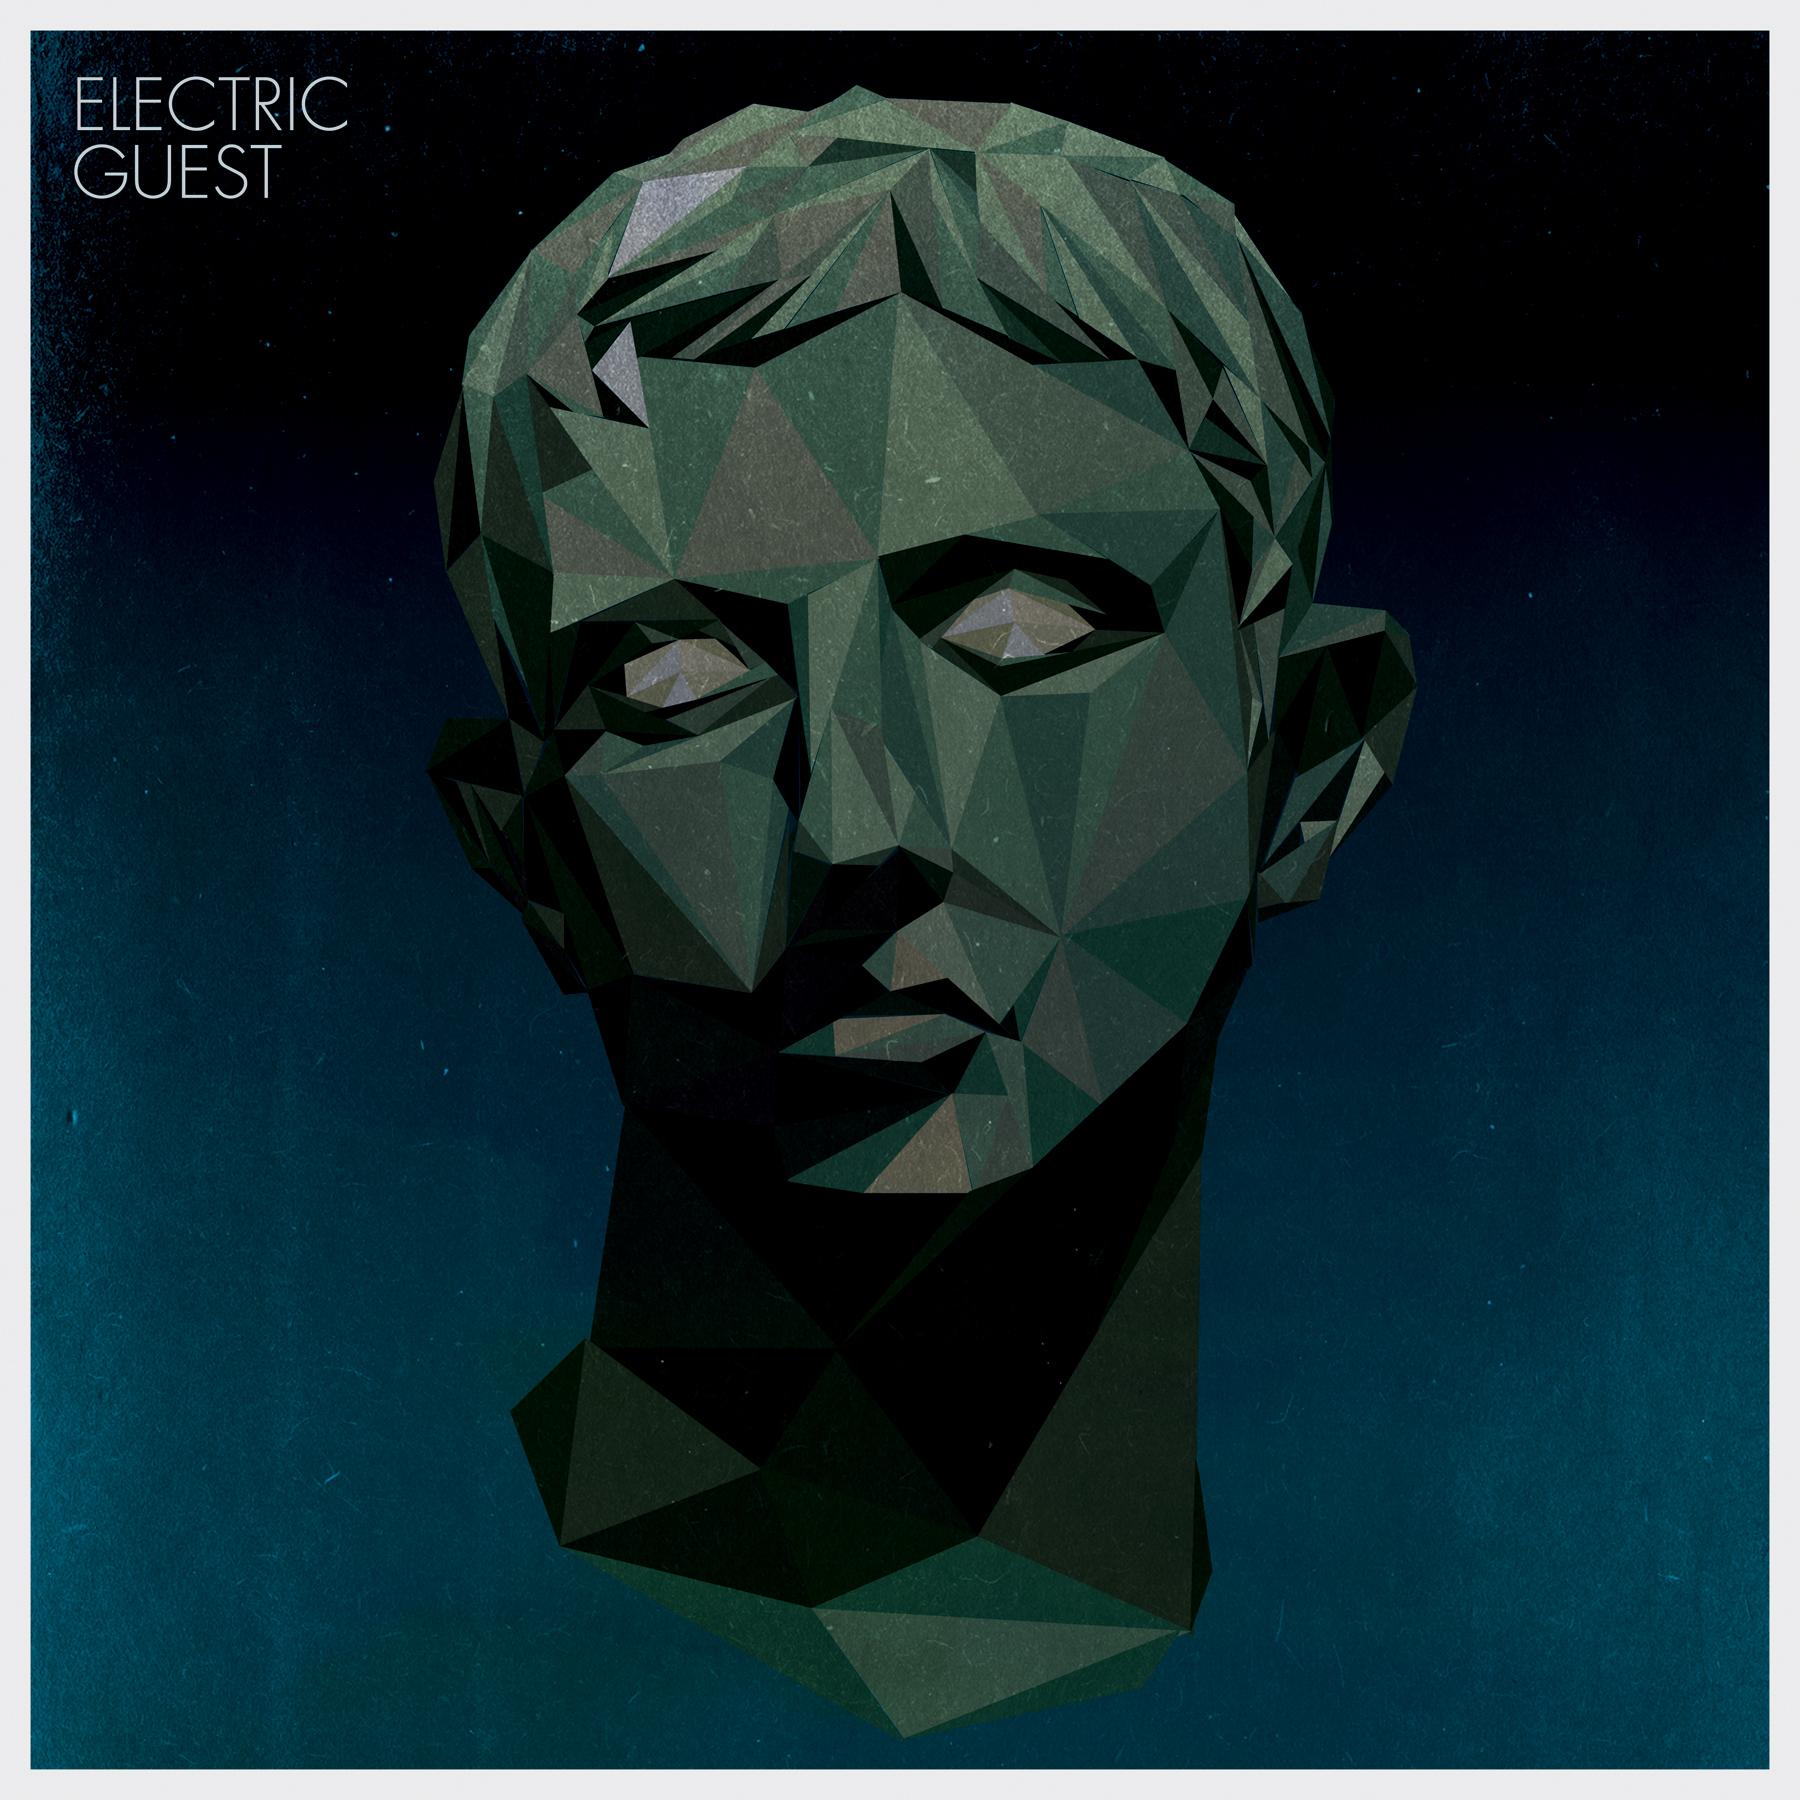 Electric_Guest_Mondo__Album_Cover